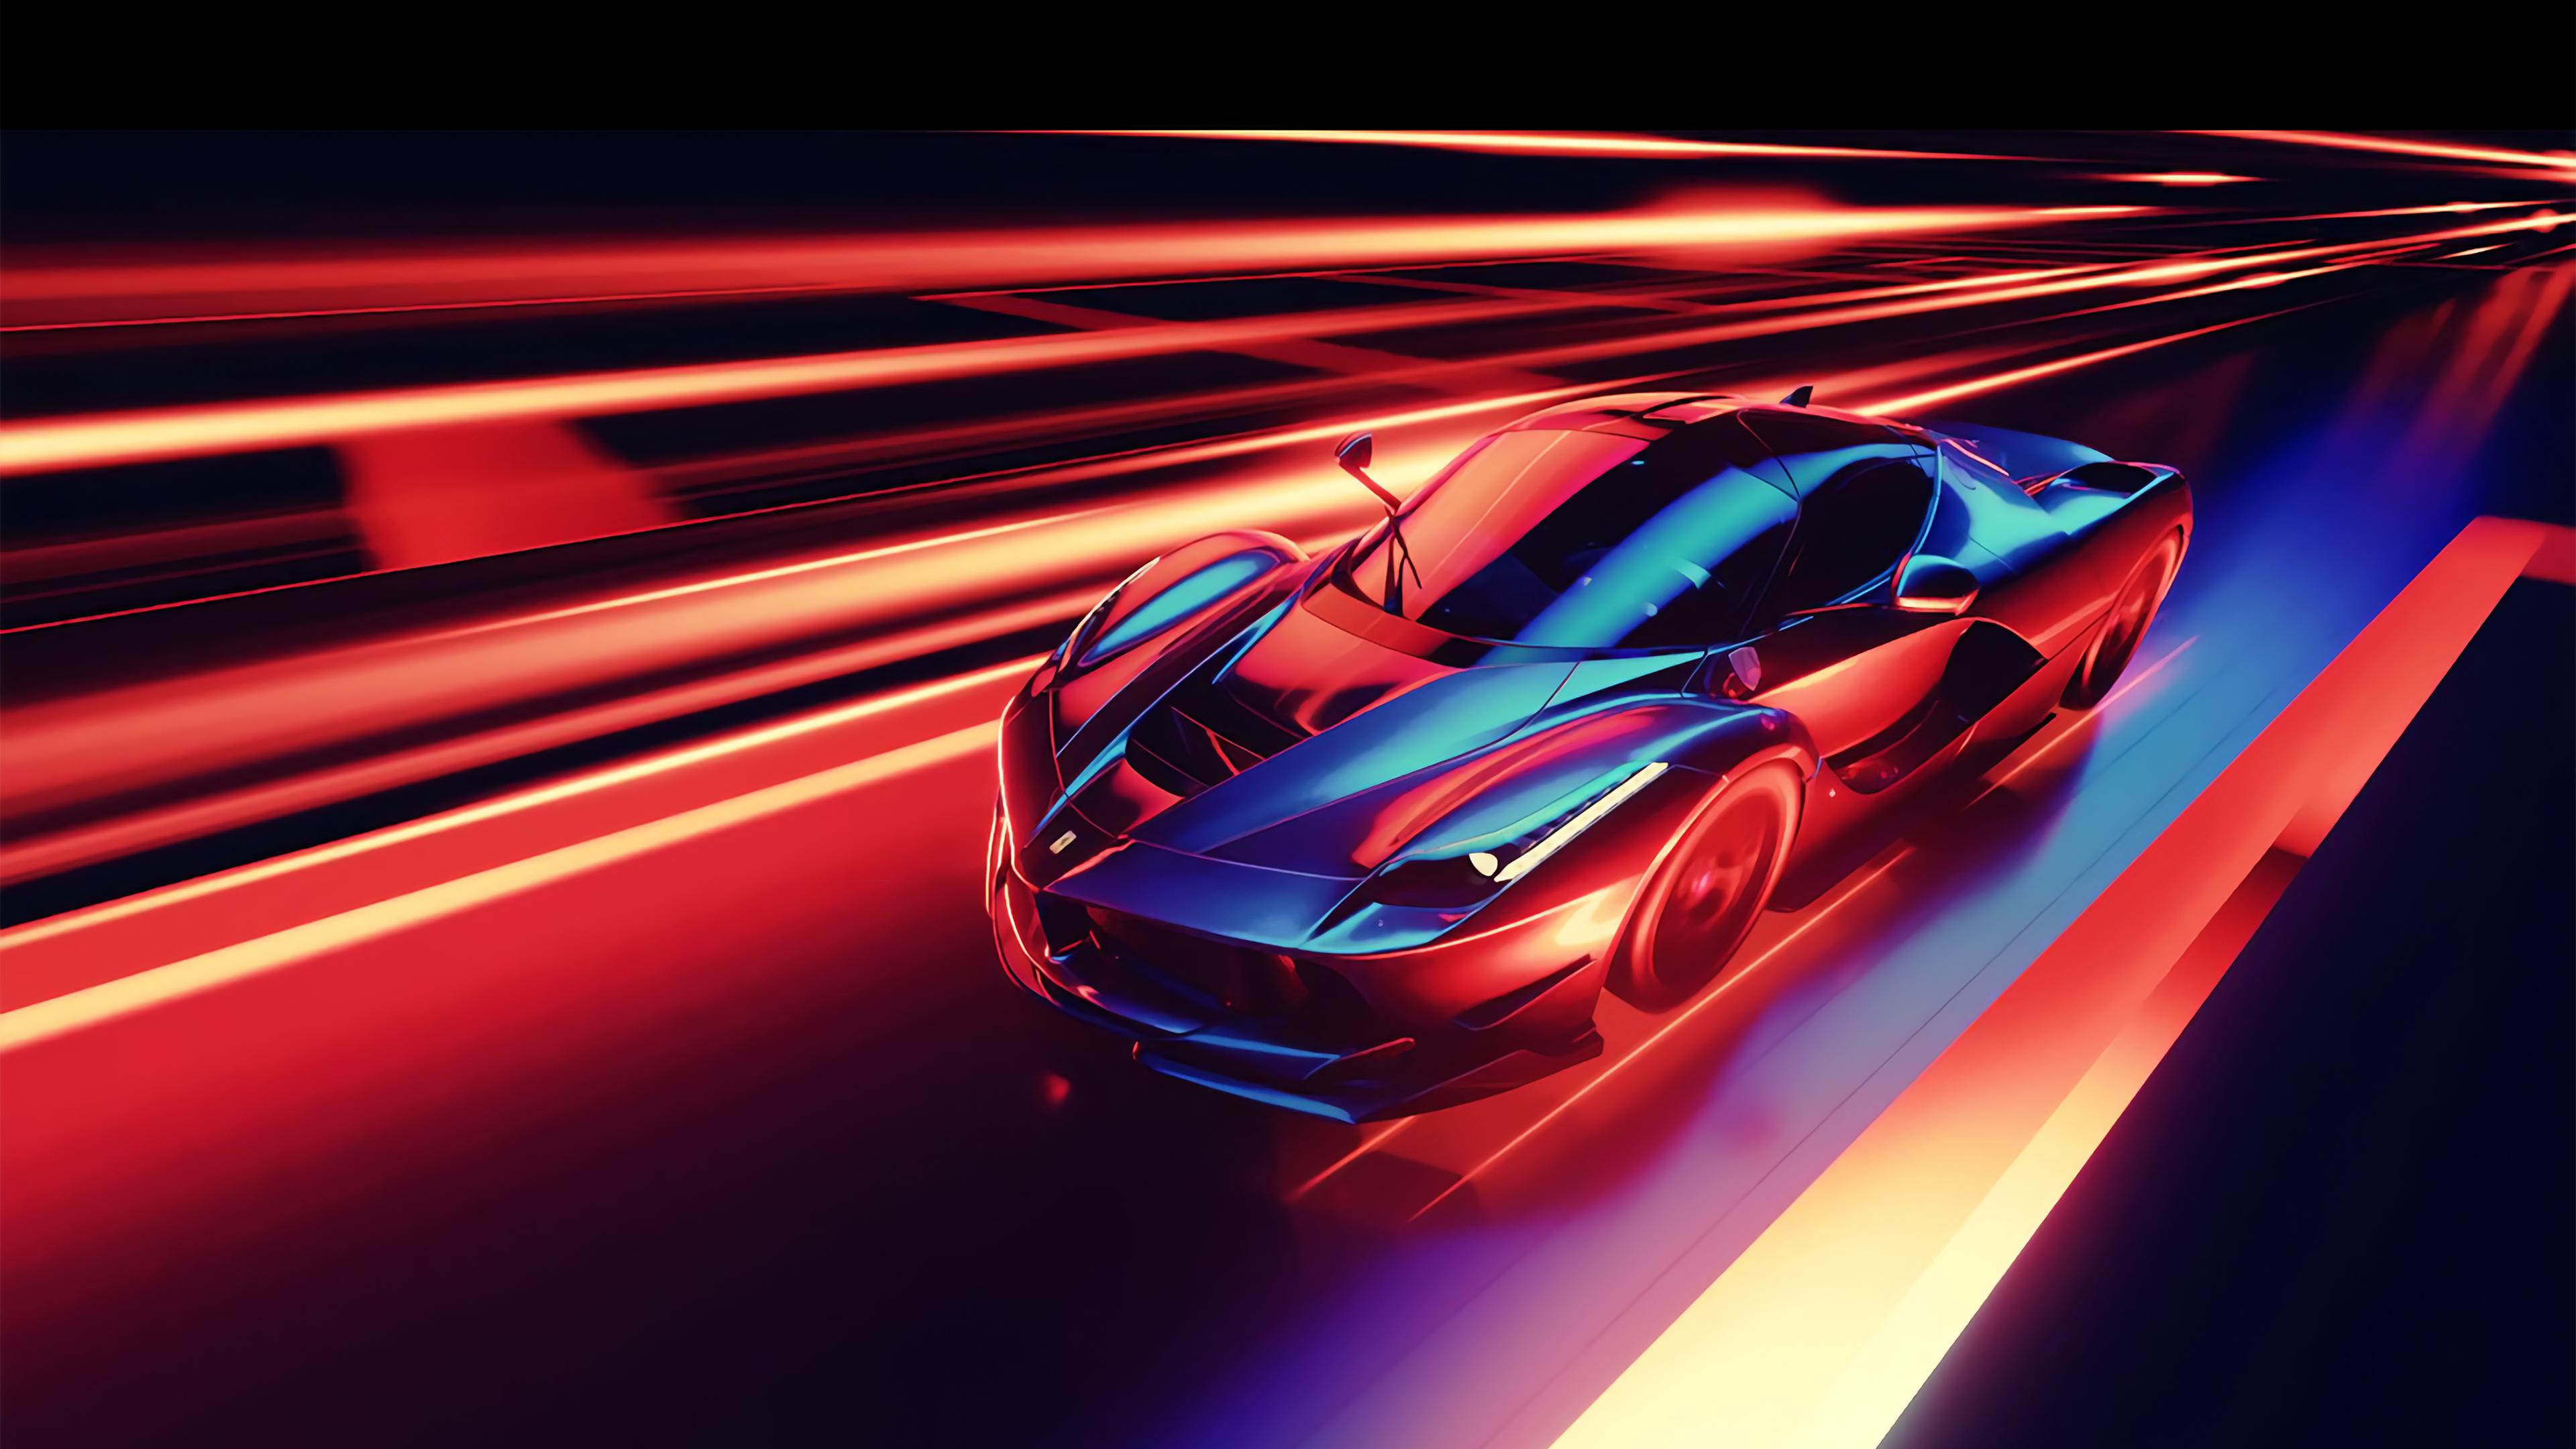 CGI Ferrari Car 4K Wallpapers HD Wallpapers 3840x2160